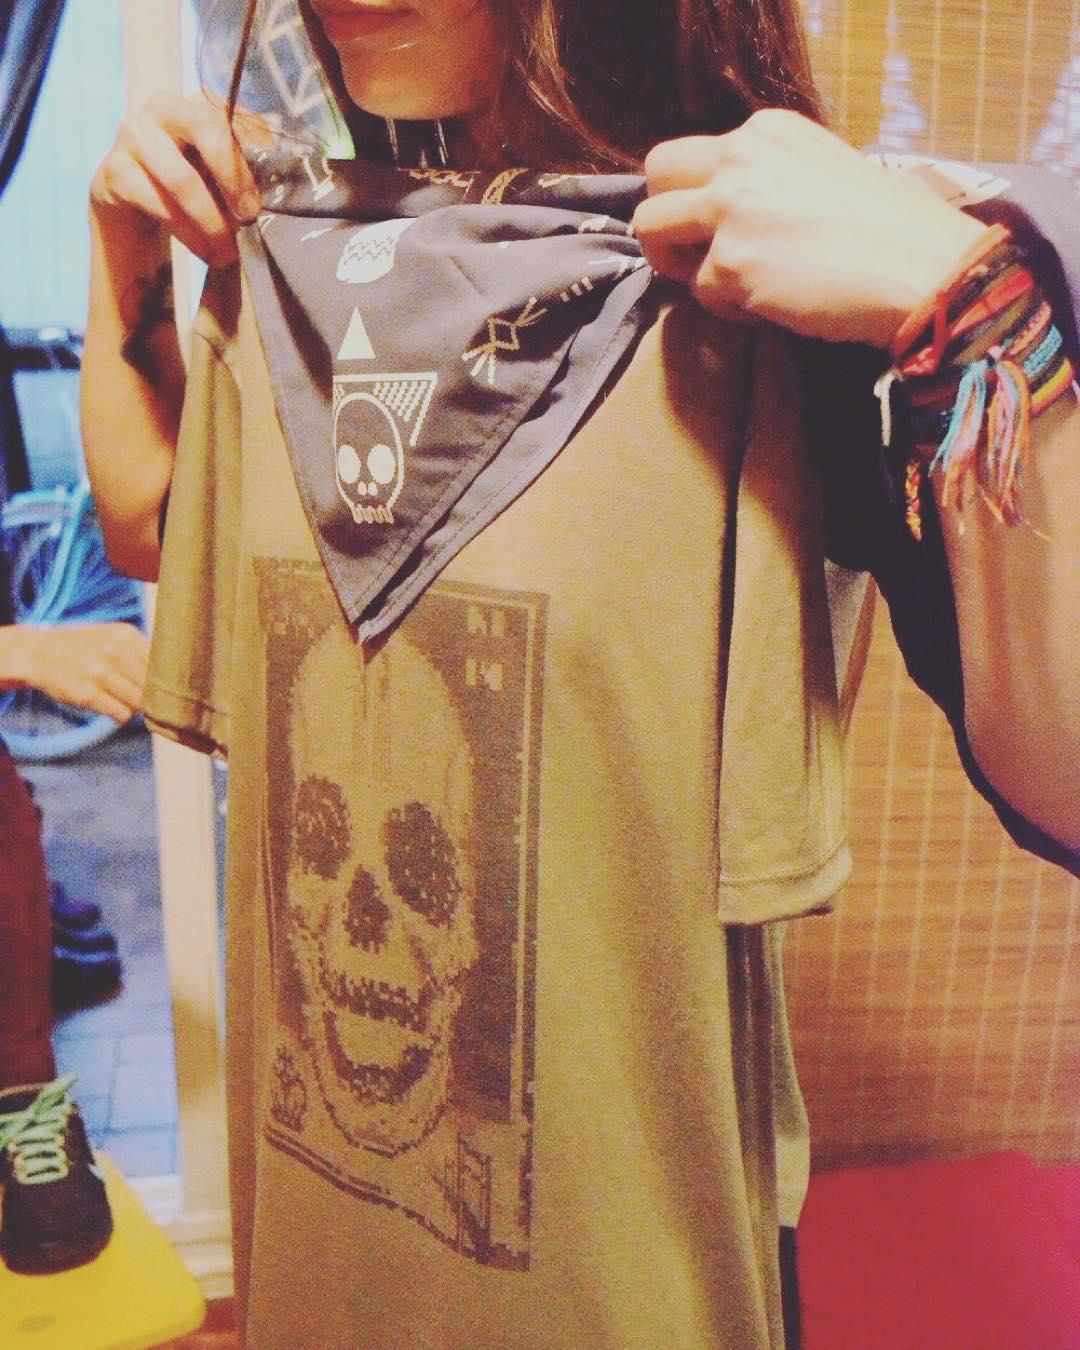 UR style para @zfckoficial  #bandana + #remera #skull #pixel #pixelart #style #urban PH #deuxamiscomunicacion ⭐️